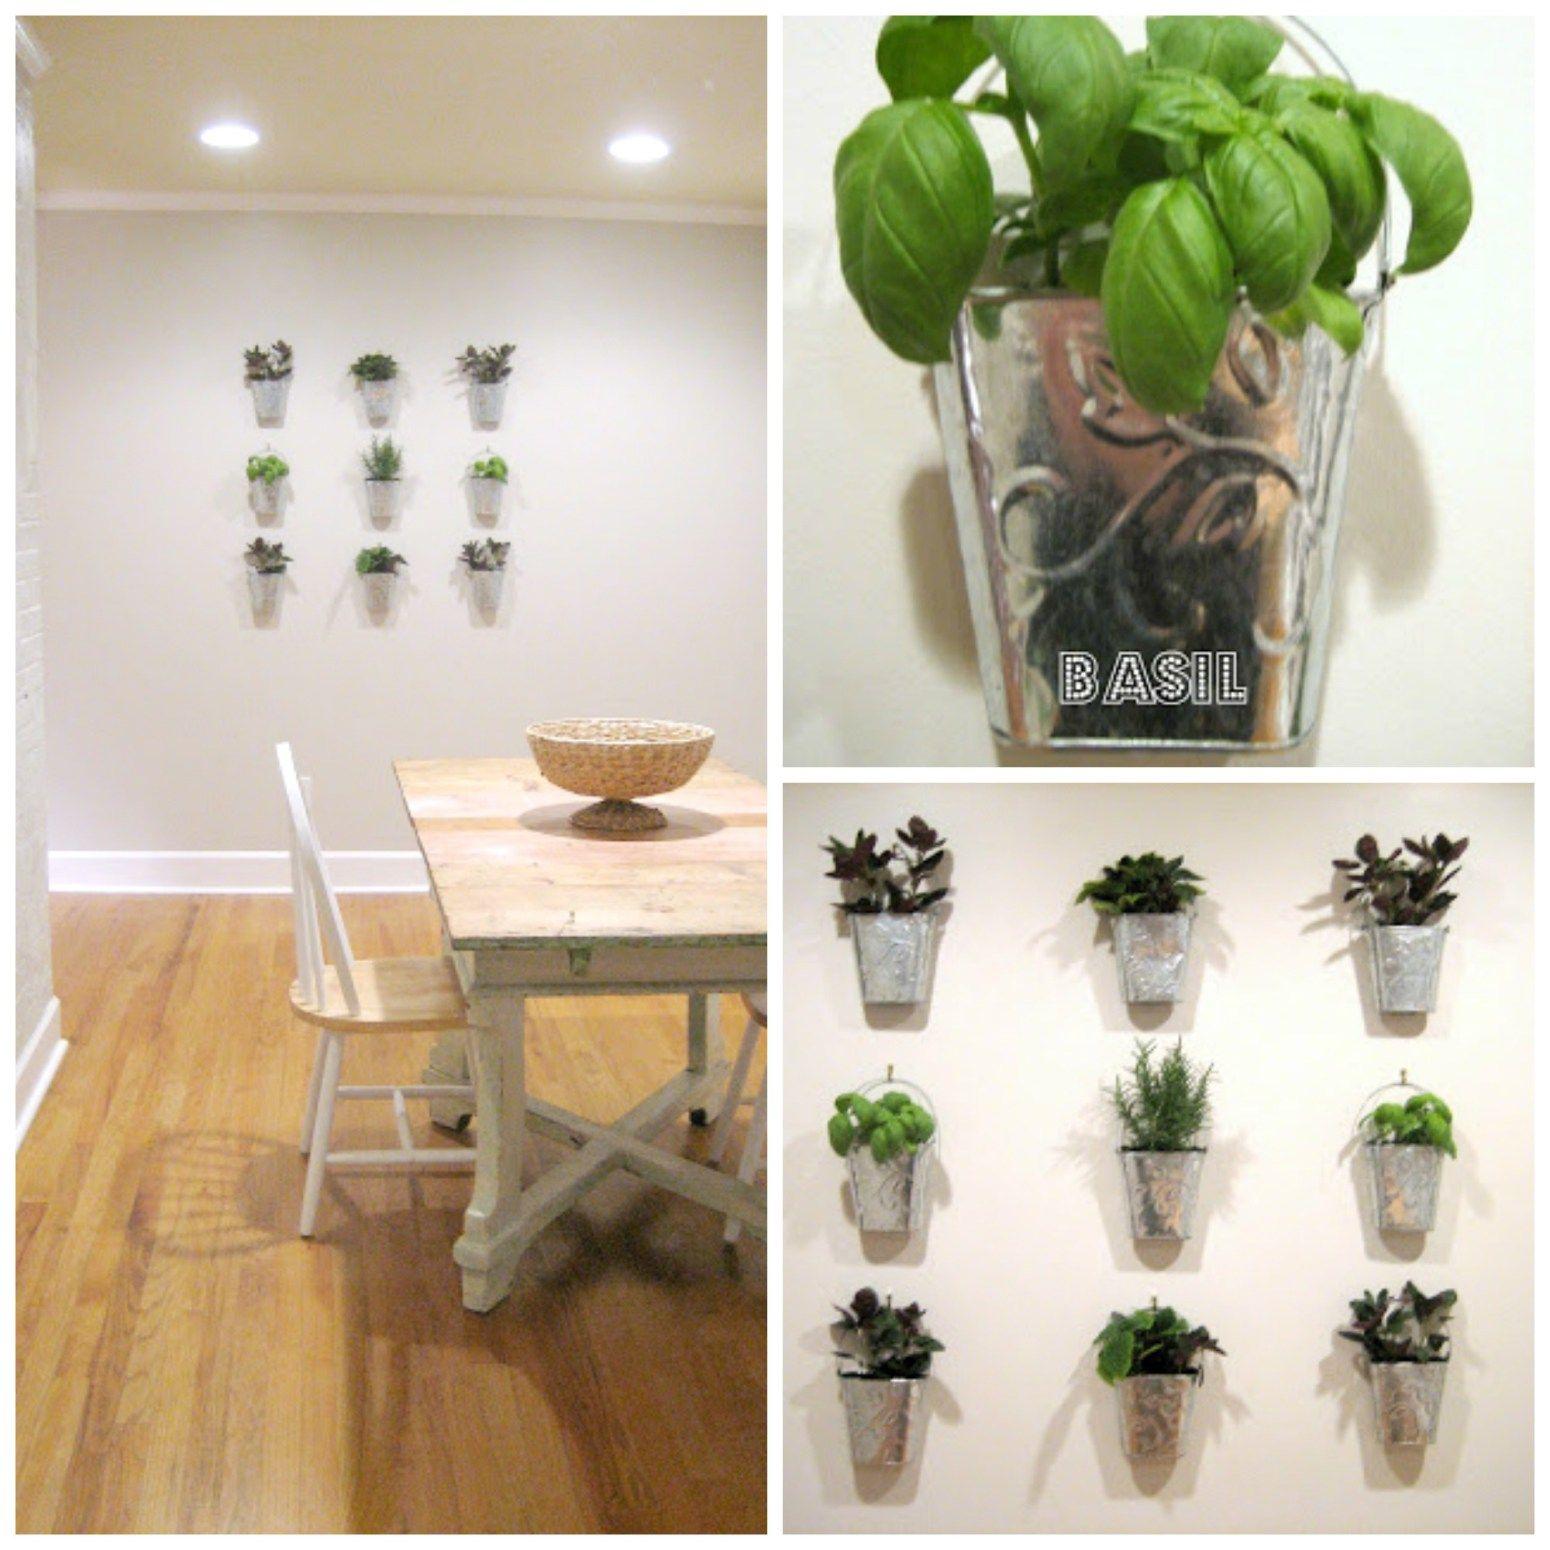 guest project make a kitchen garden wall garden on indoor herb garden diy wall kitchens id=48059